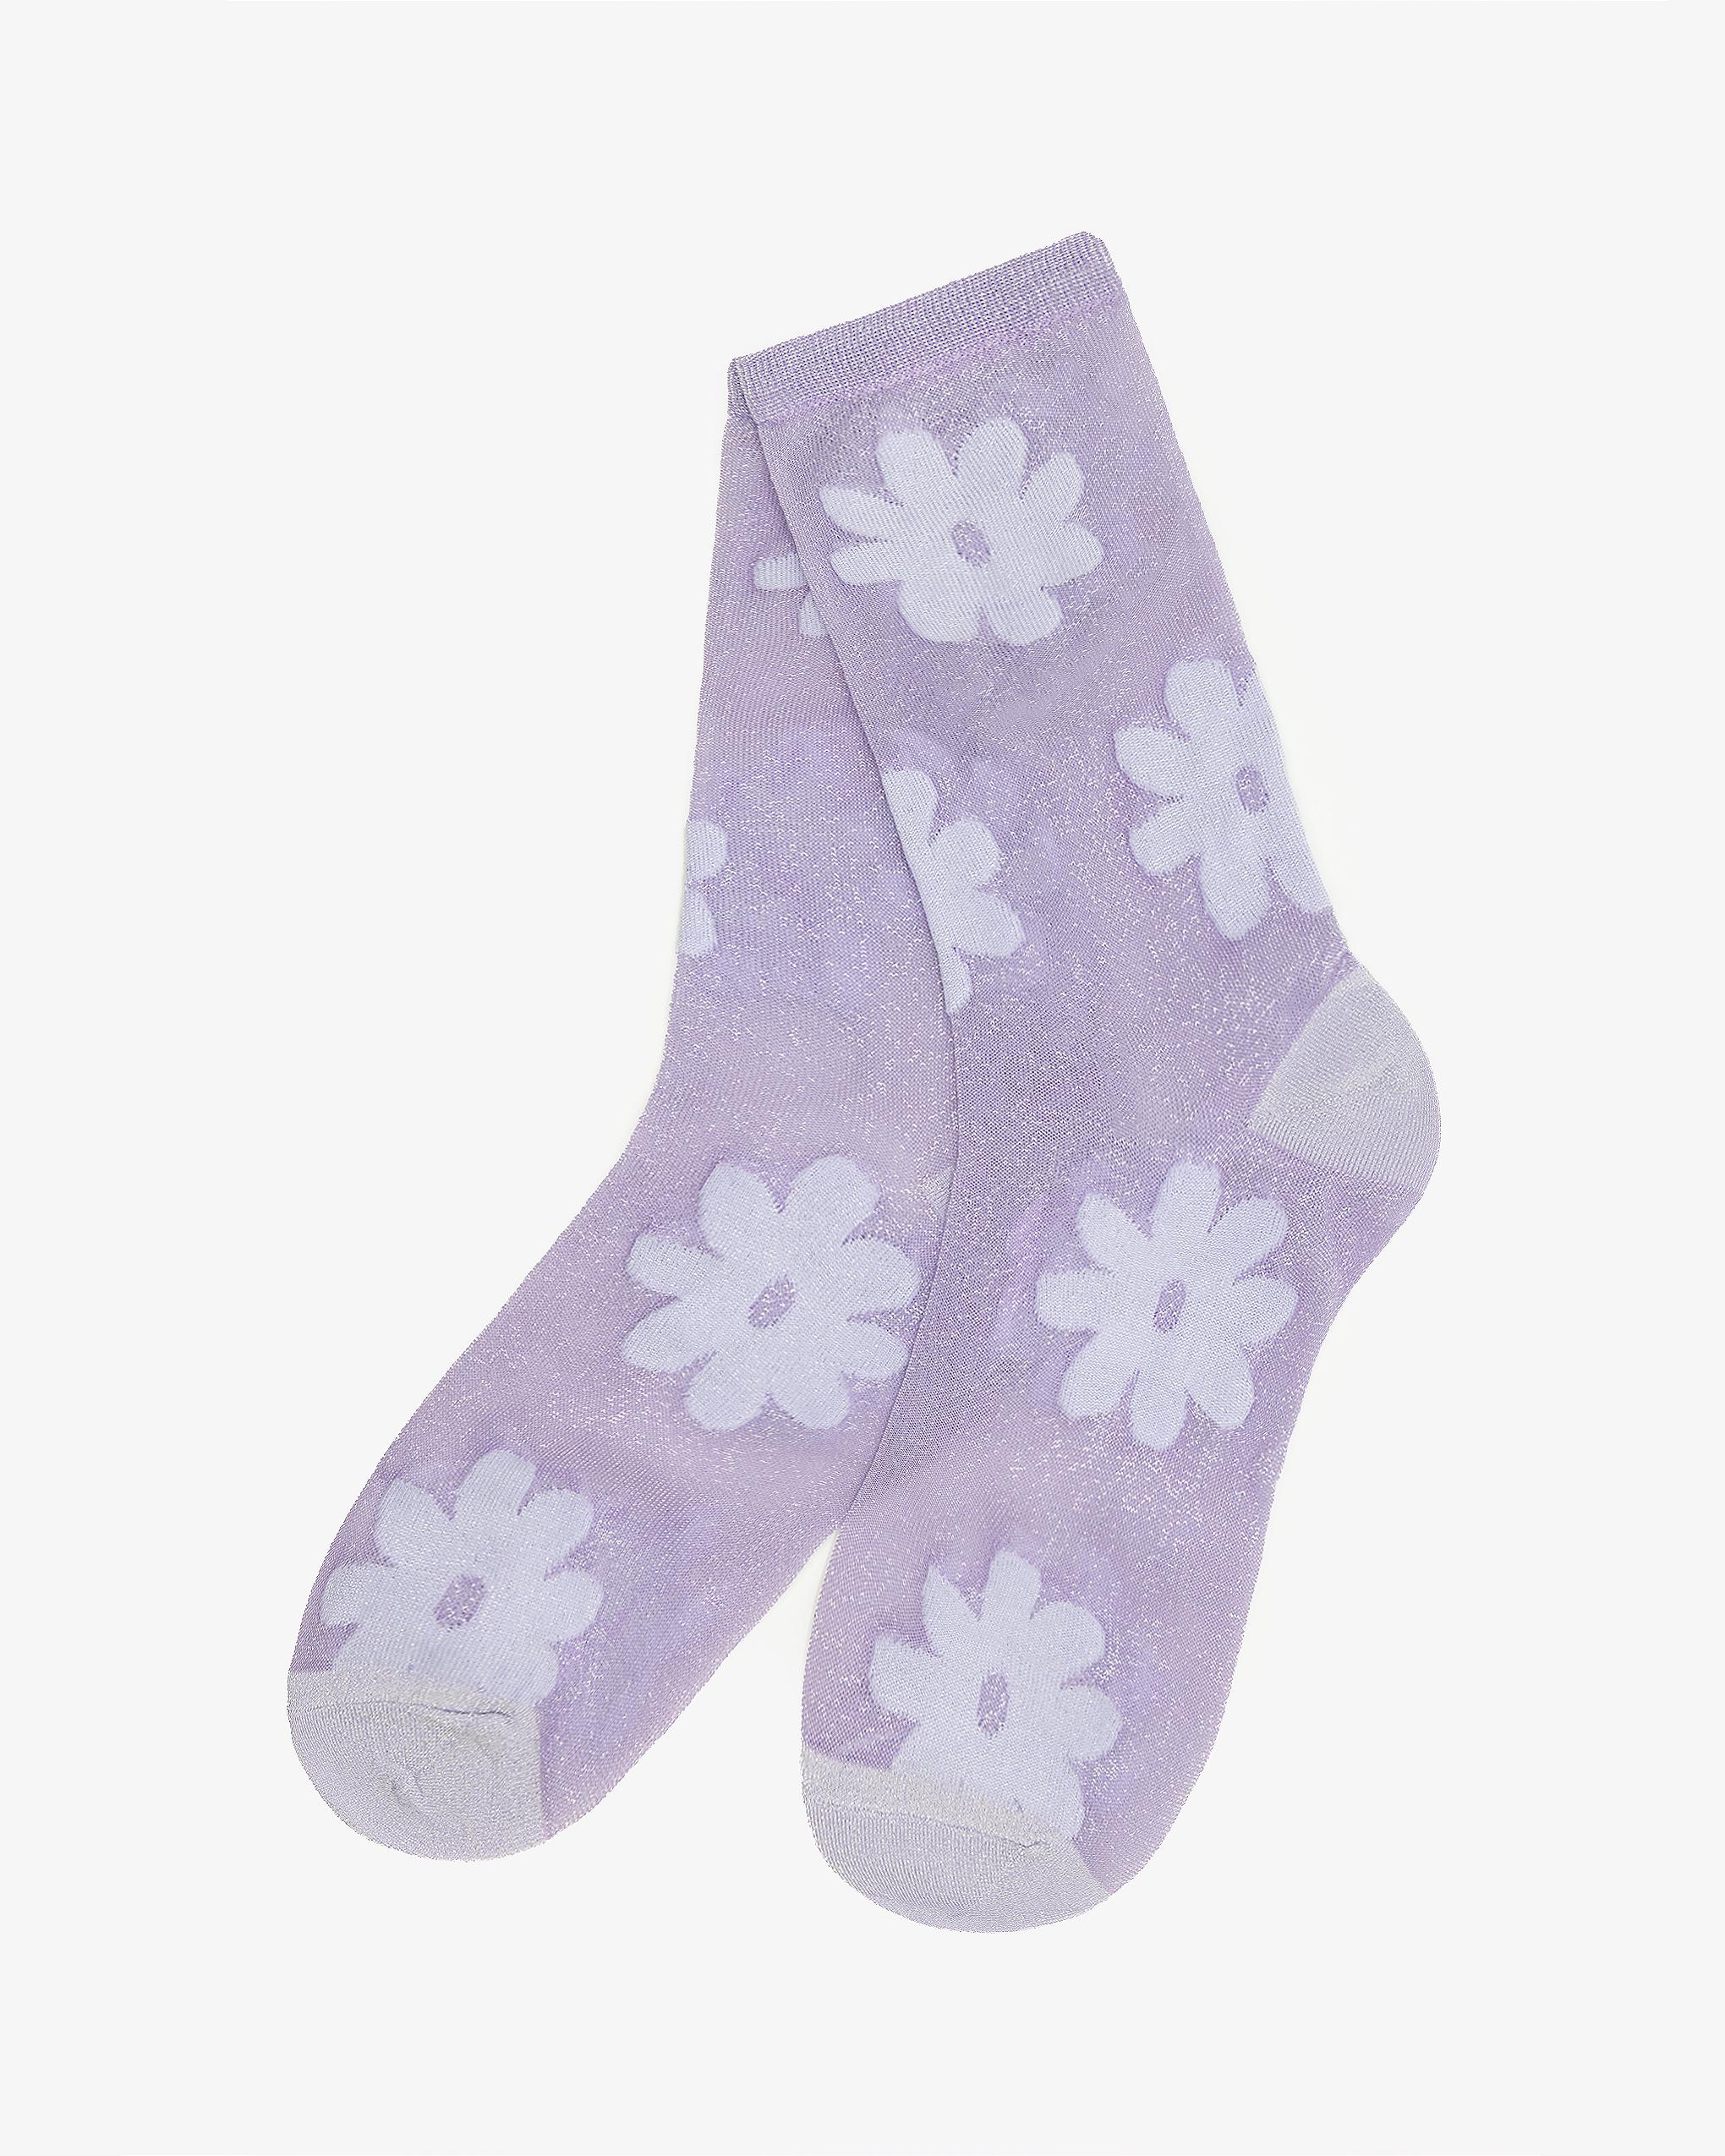 EMIN + PAUL lilac flower socks.